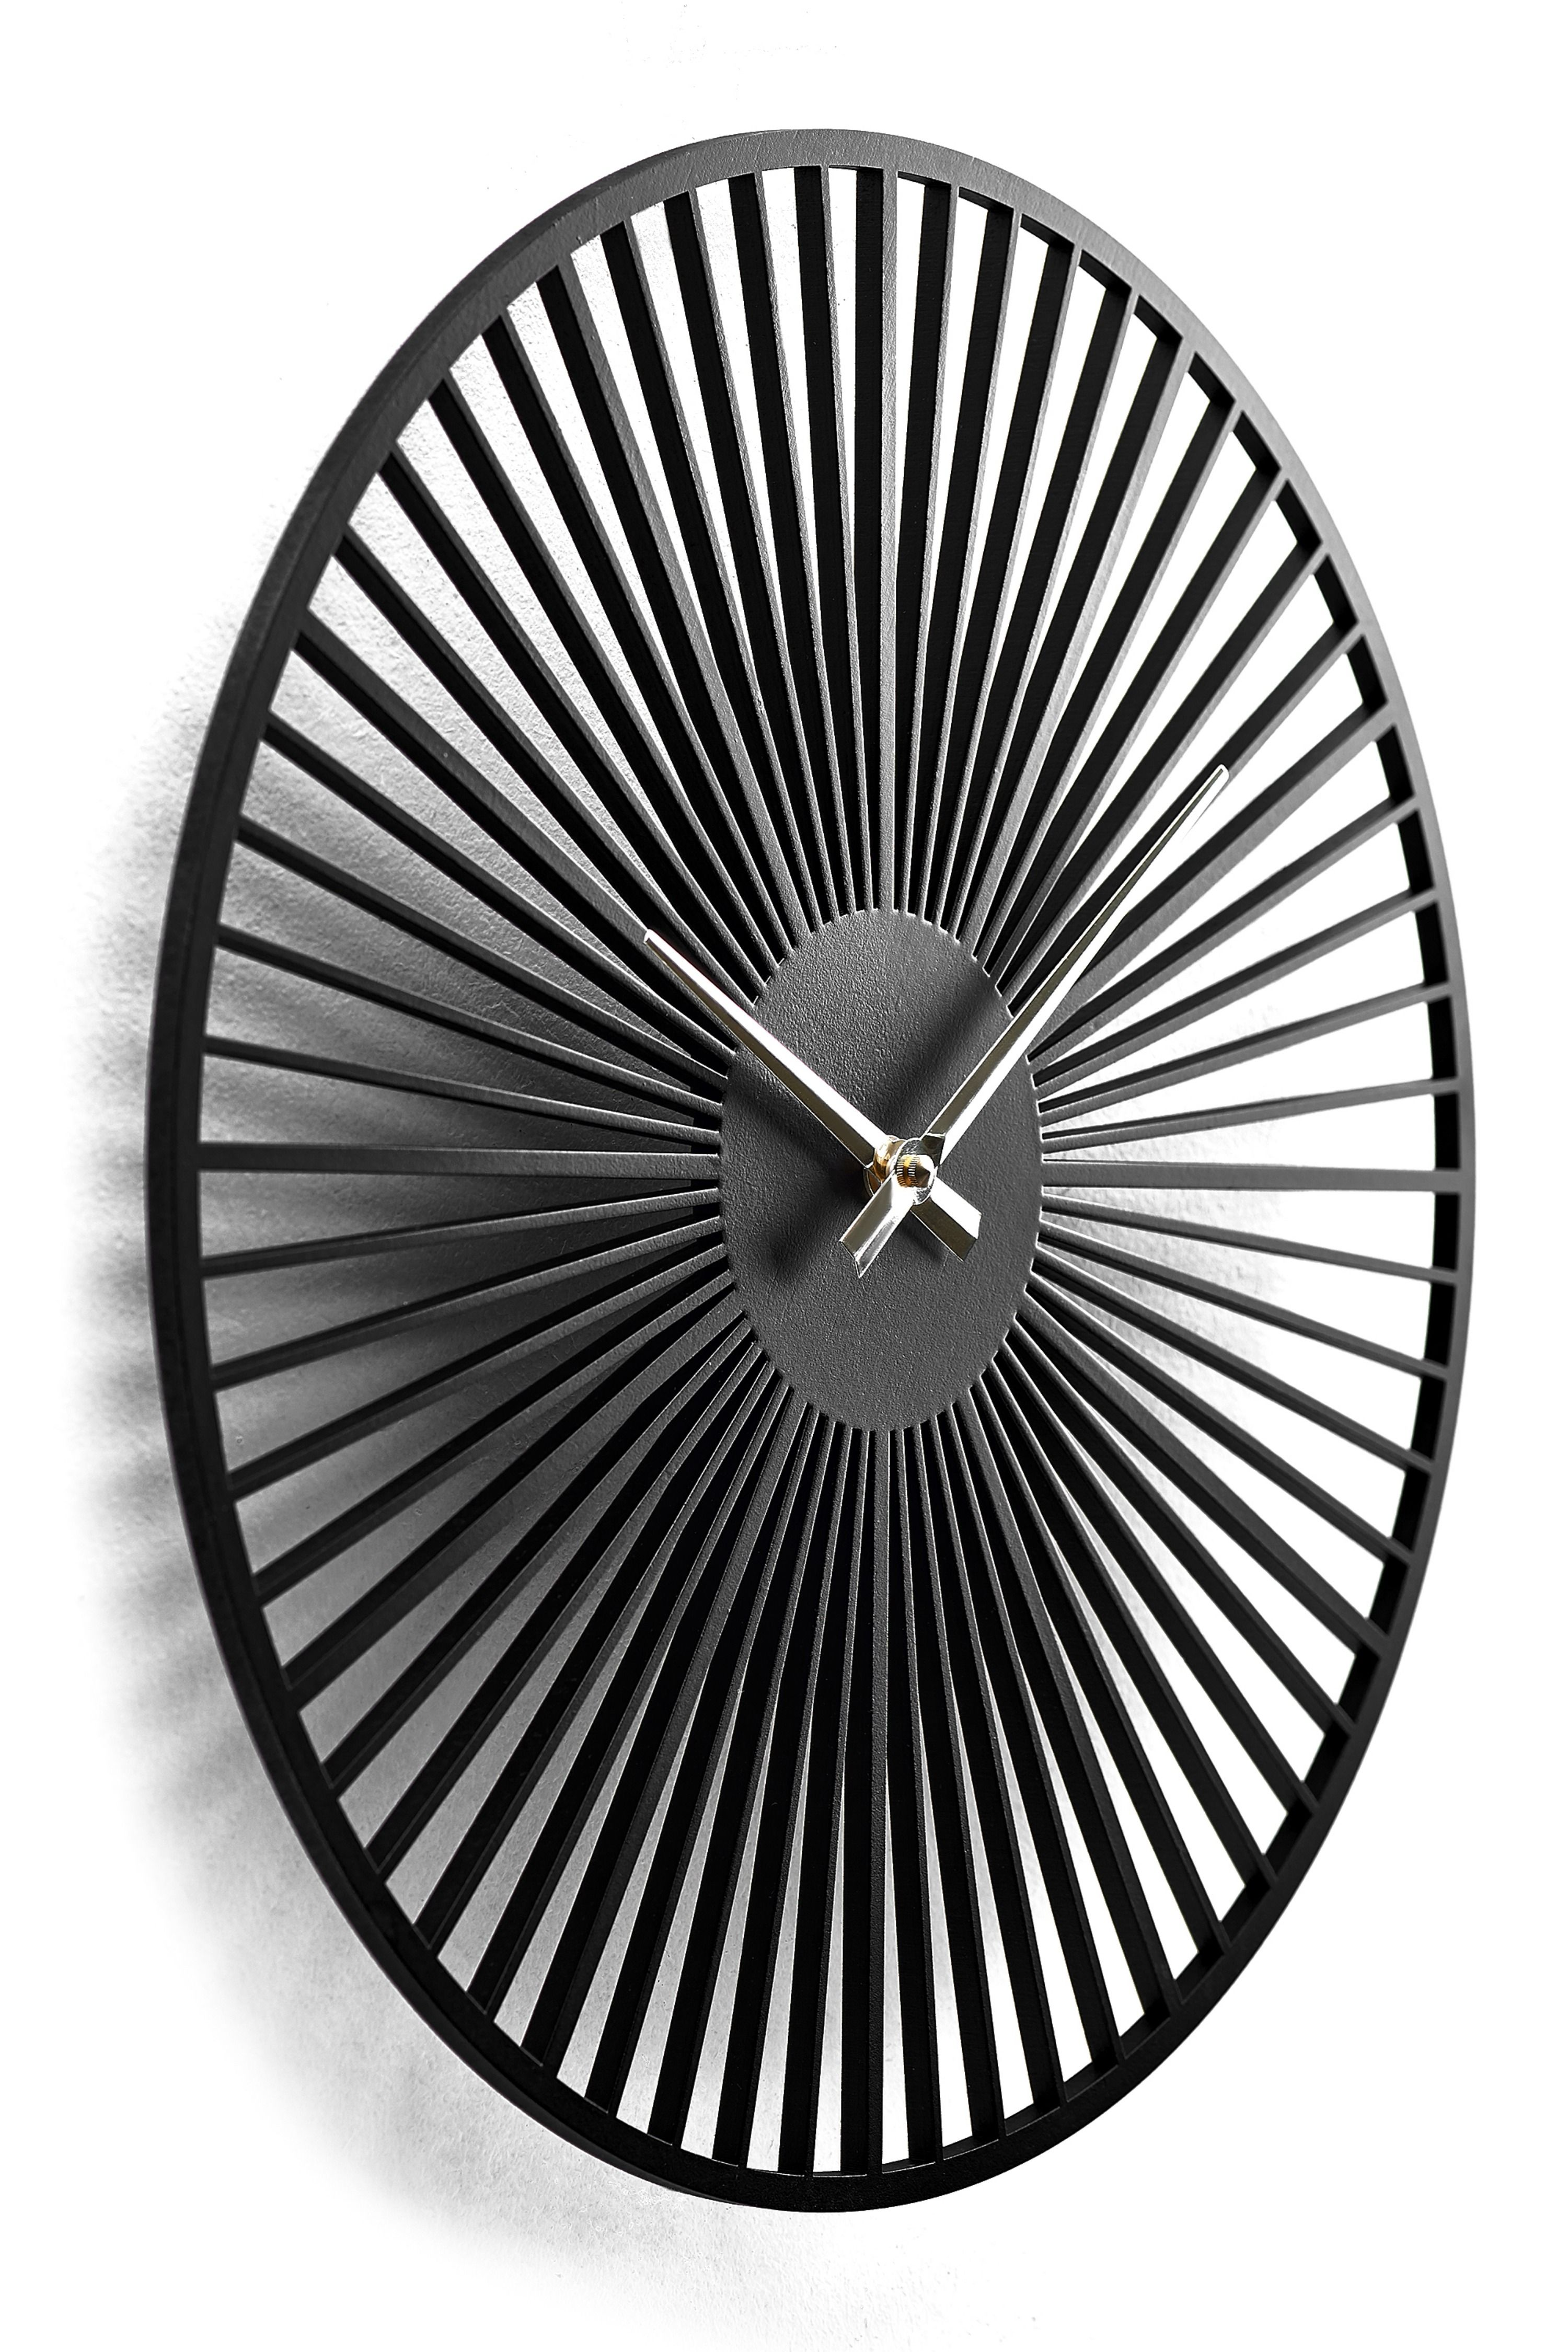 Wooden Wall Clock Moku Circum Wall Clock Design Black Wall Clock Wall Clock Modern